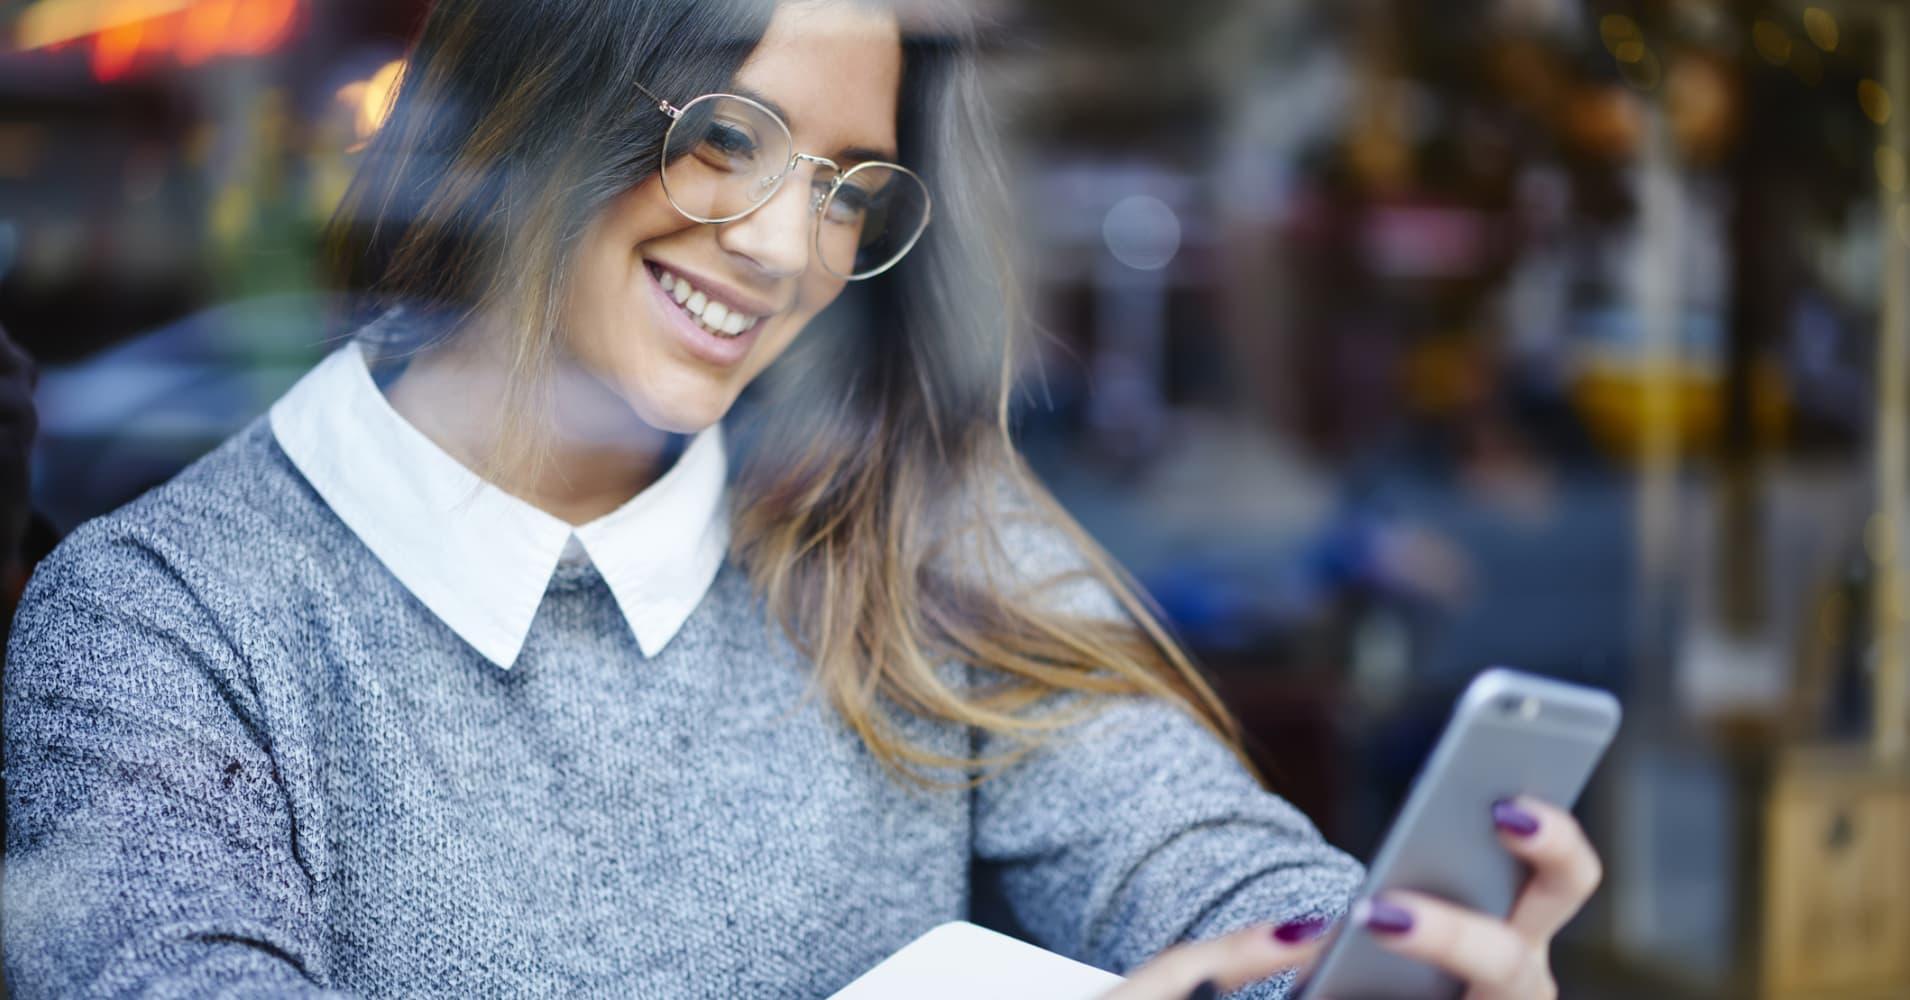 recruitment and careers  bitmojis could bag your next job